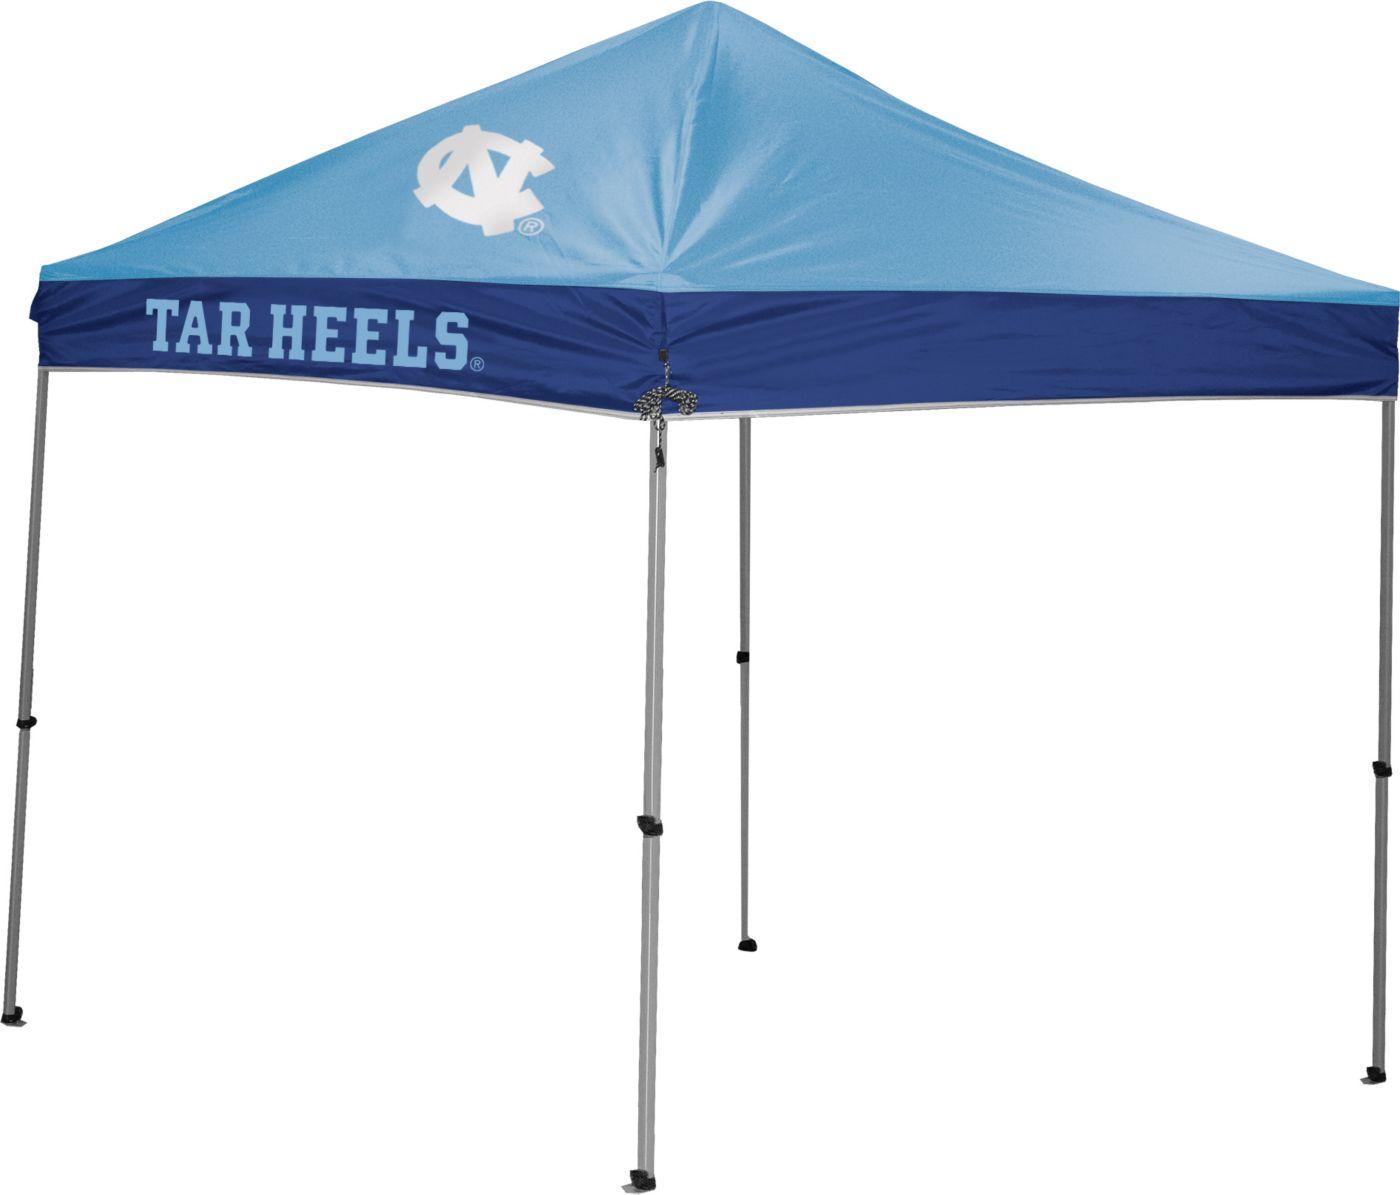 Rawlings North Carolina Tar Heels 9' x 9' Sideline Canopy Tent